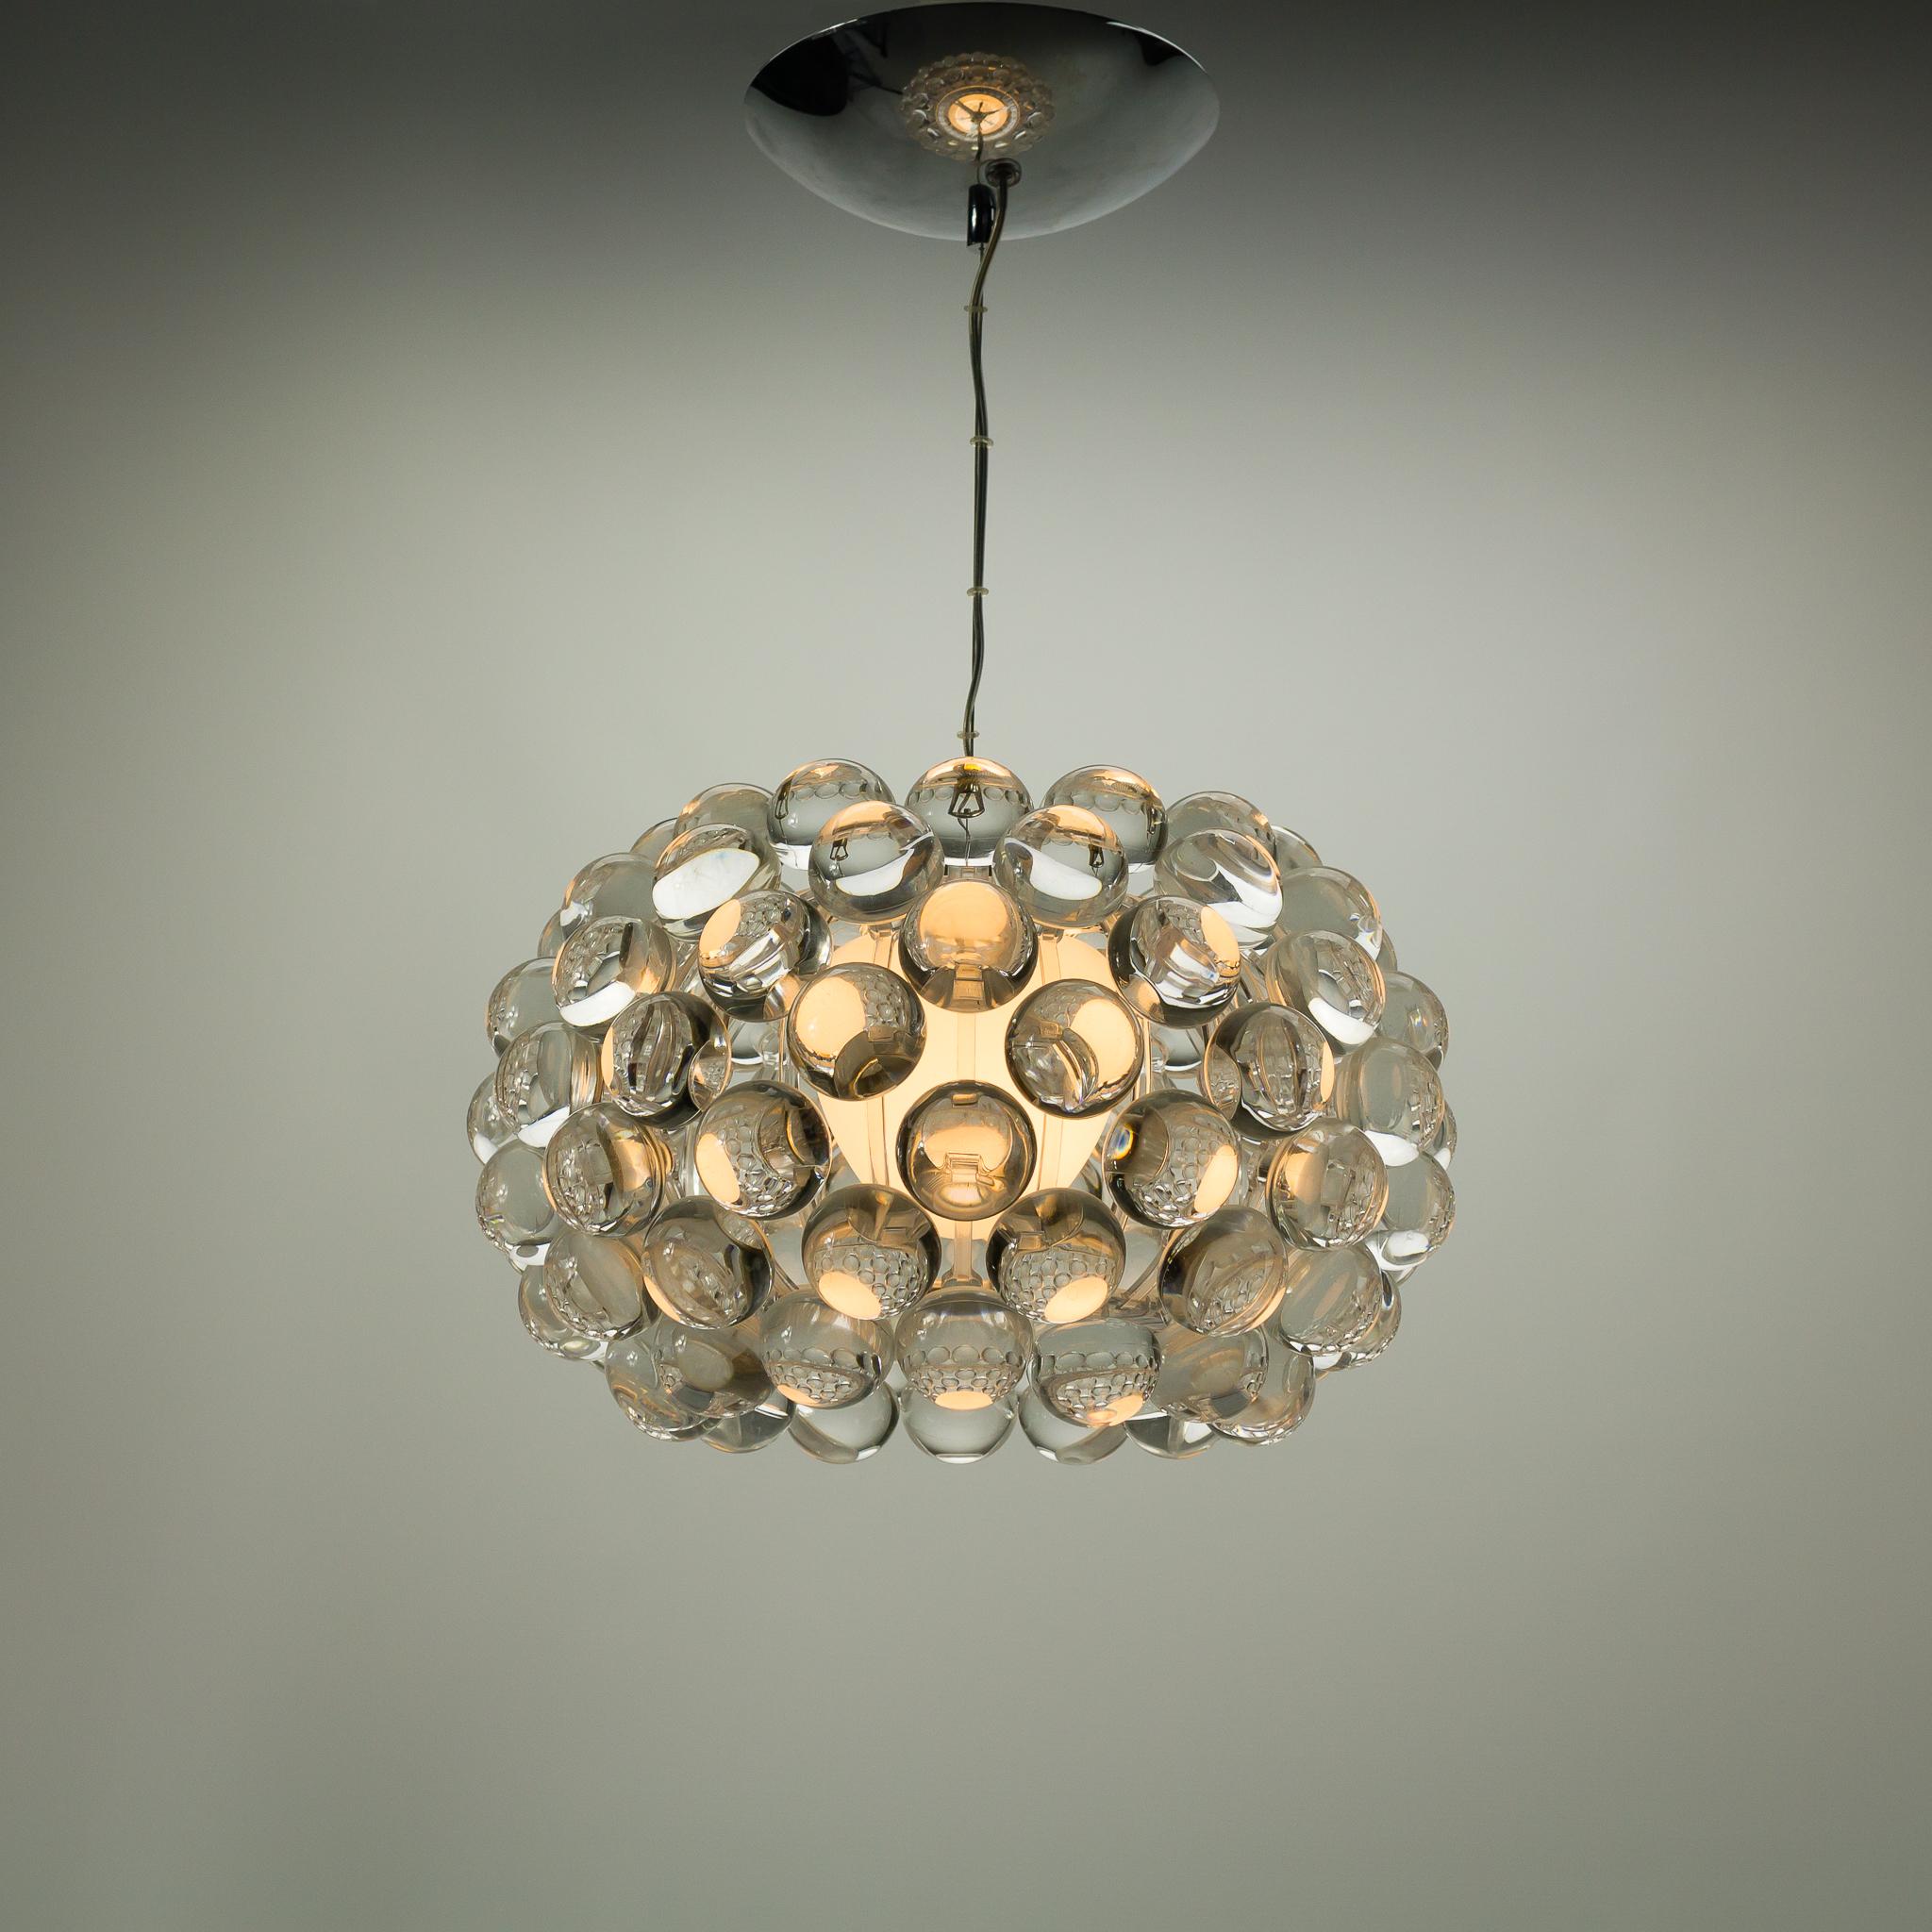 foscarini caboche sospensione piccola hanglamp 3x barbmama. Black Bedroom Furniture Sets. Home Design Ideas